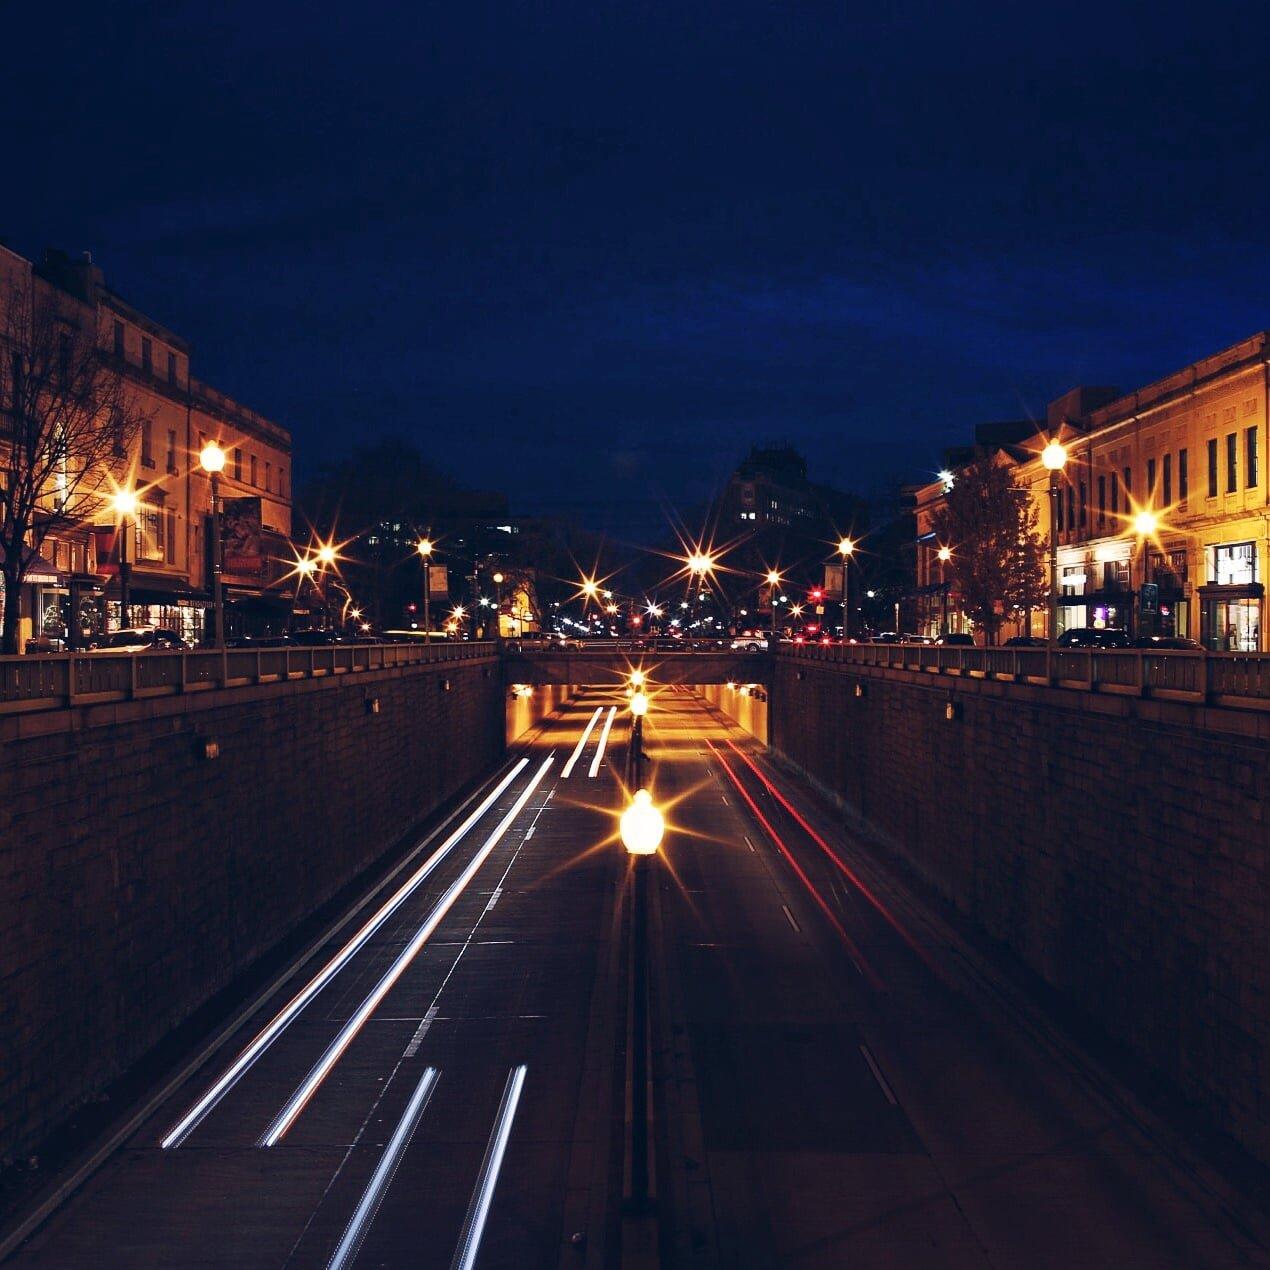 Streets Of Washington Dc At Night Photos